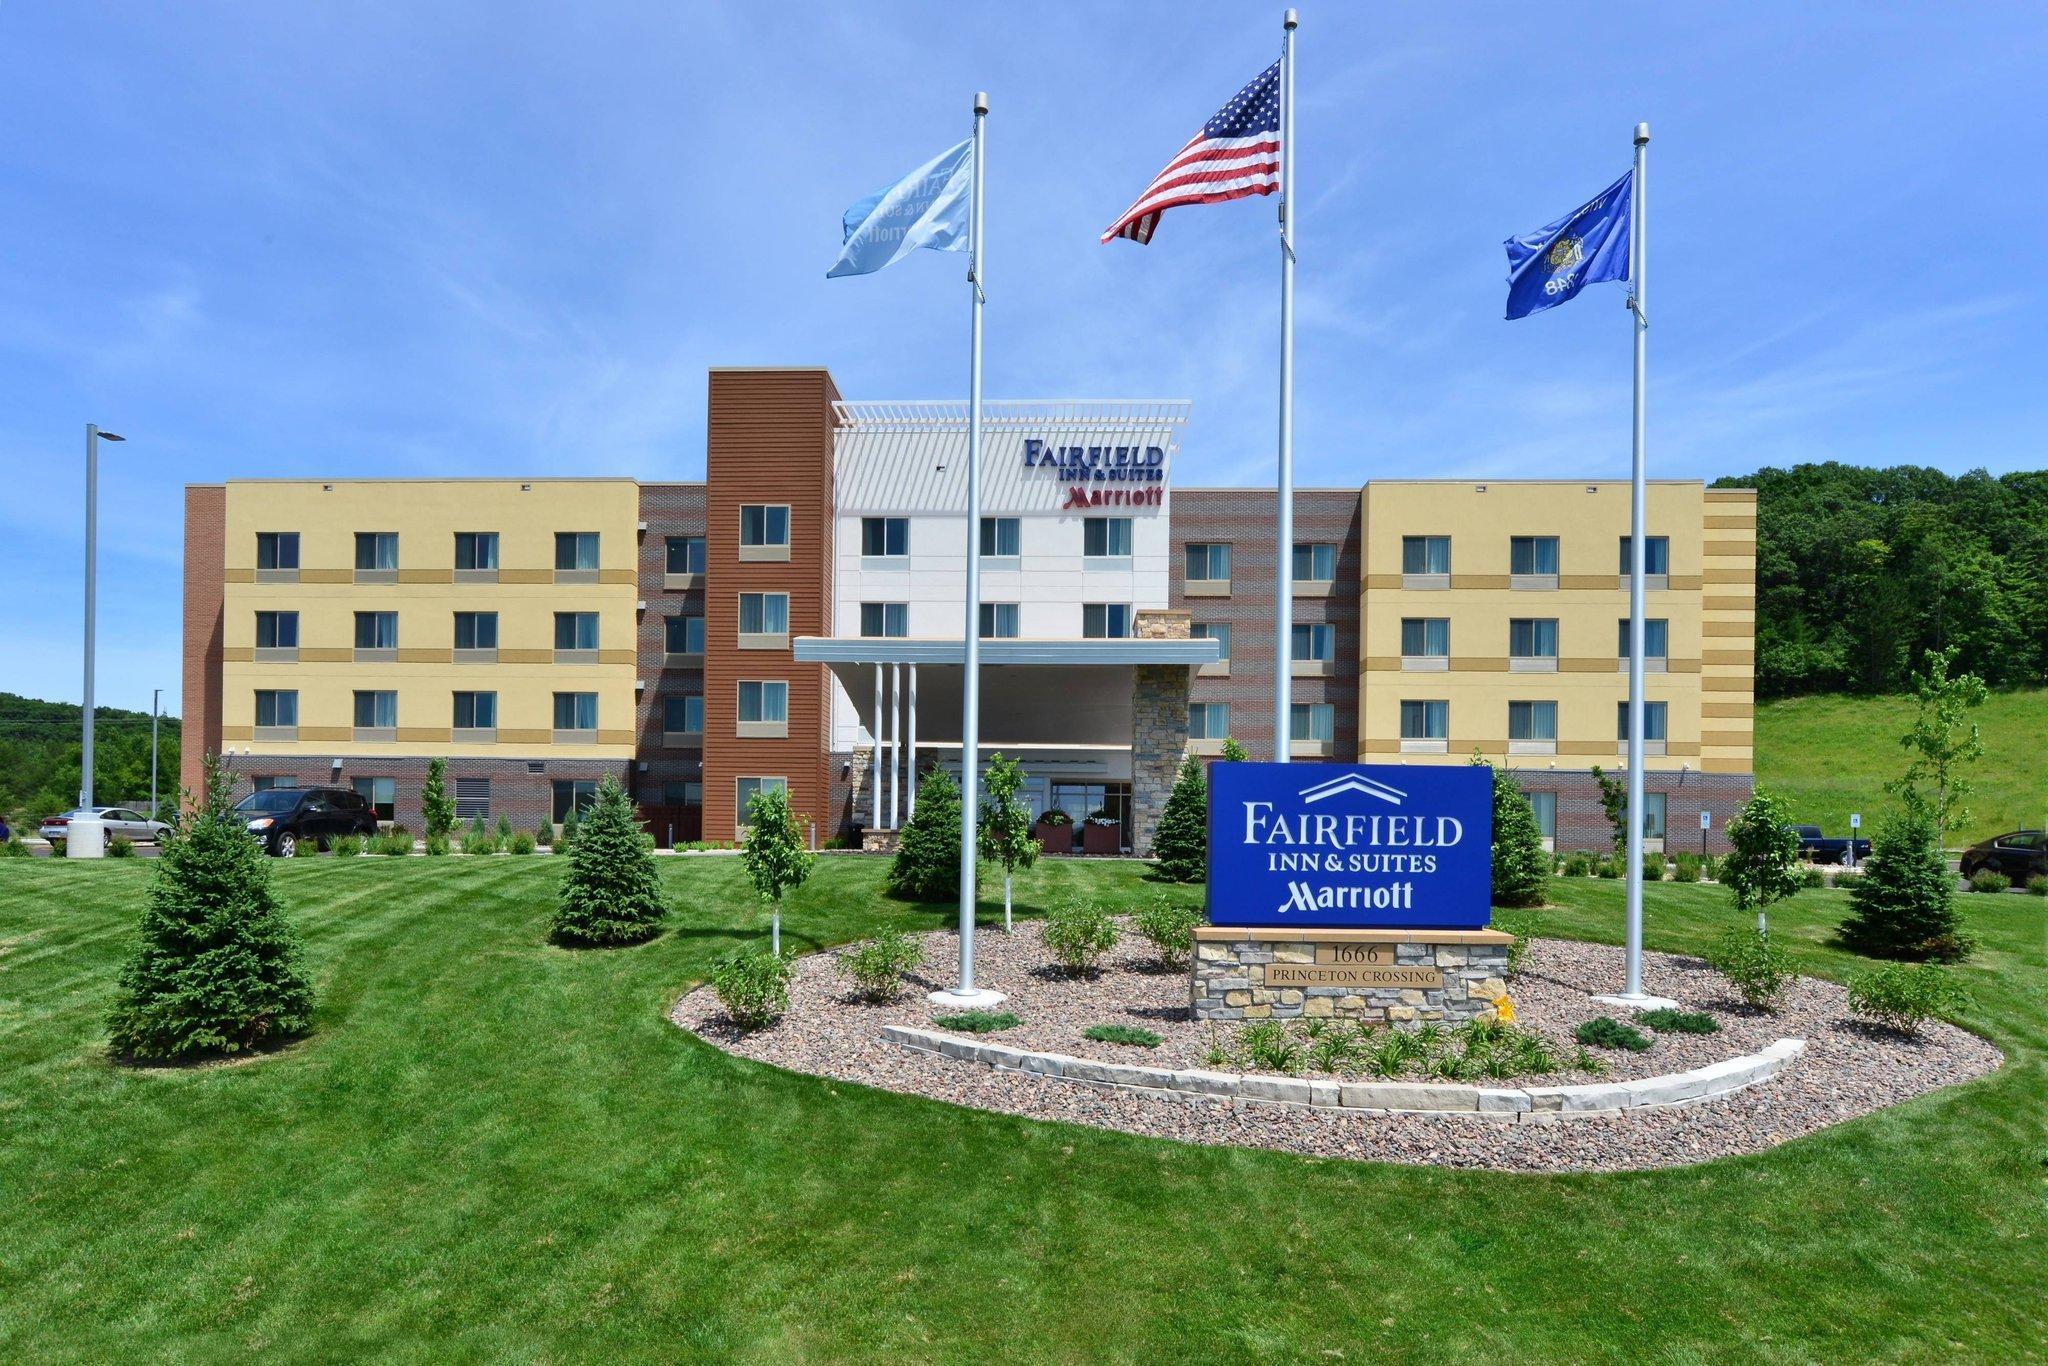 Fairfield Inn And Suites Eau Claire Chippewa Falls